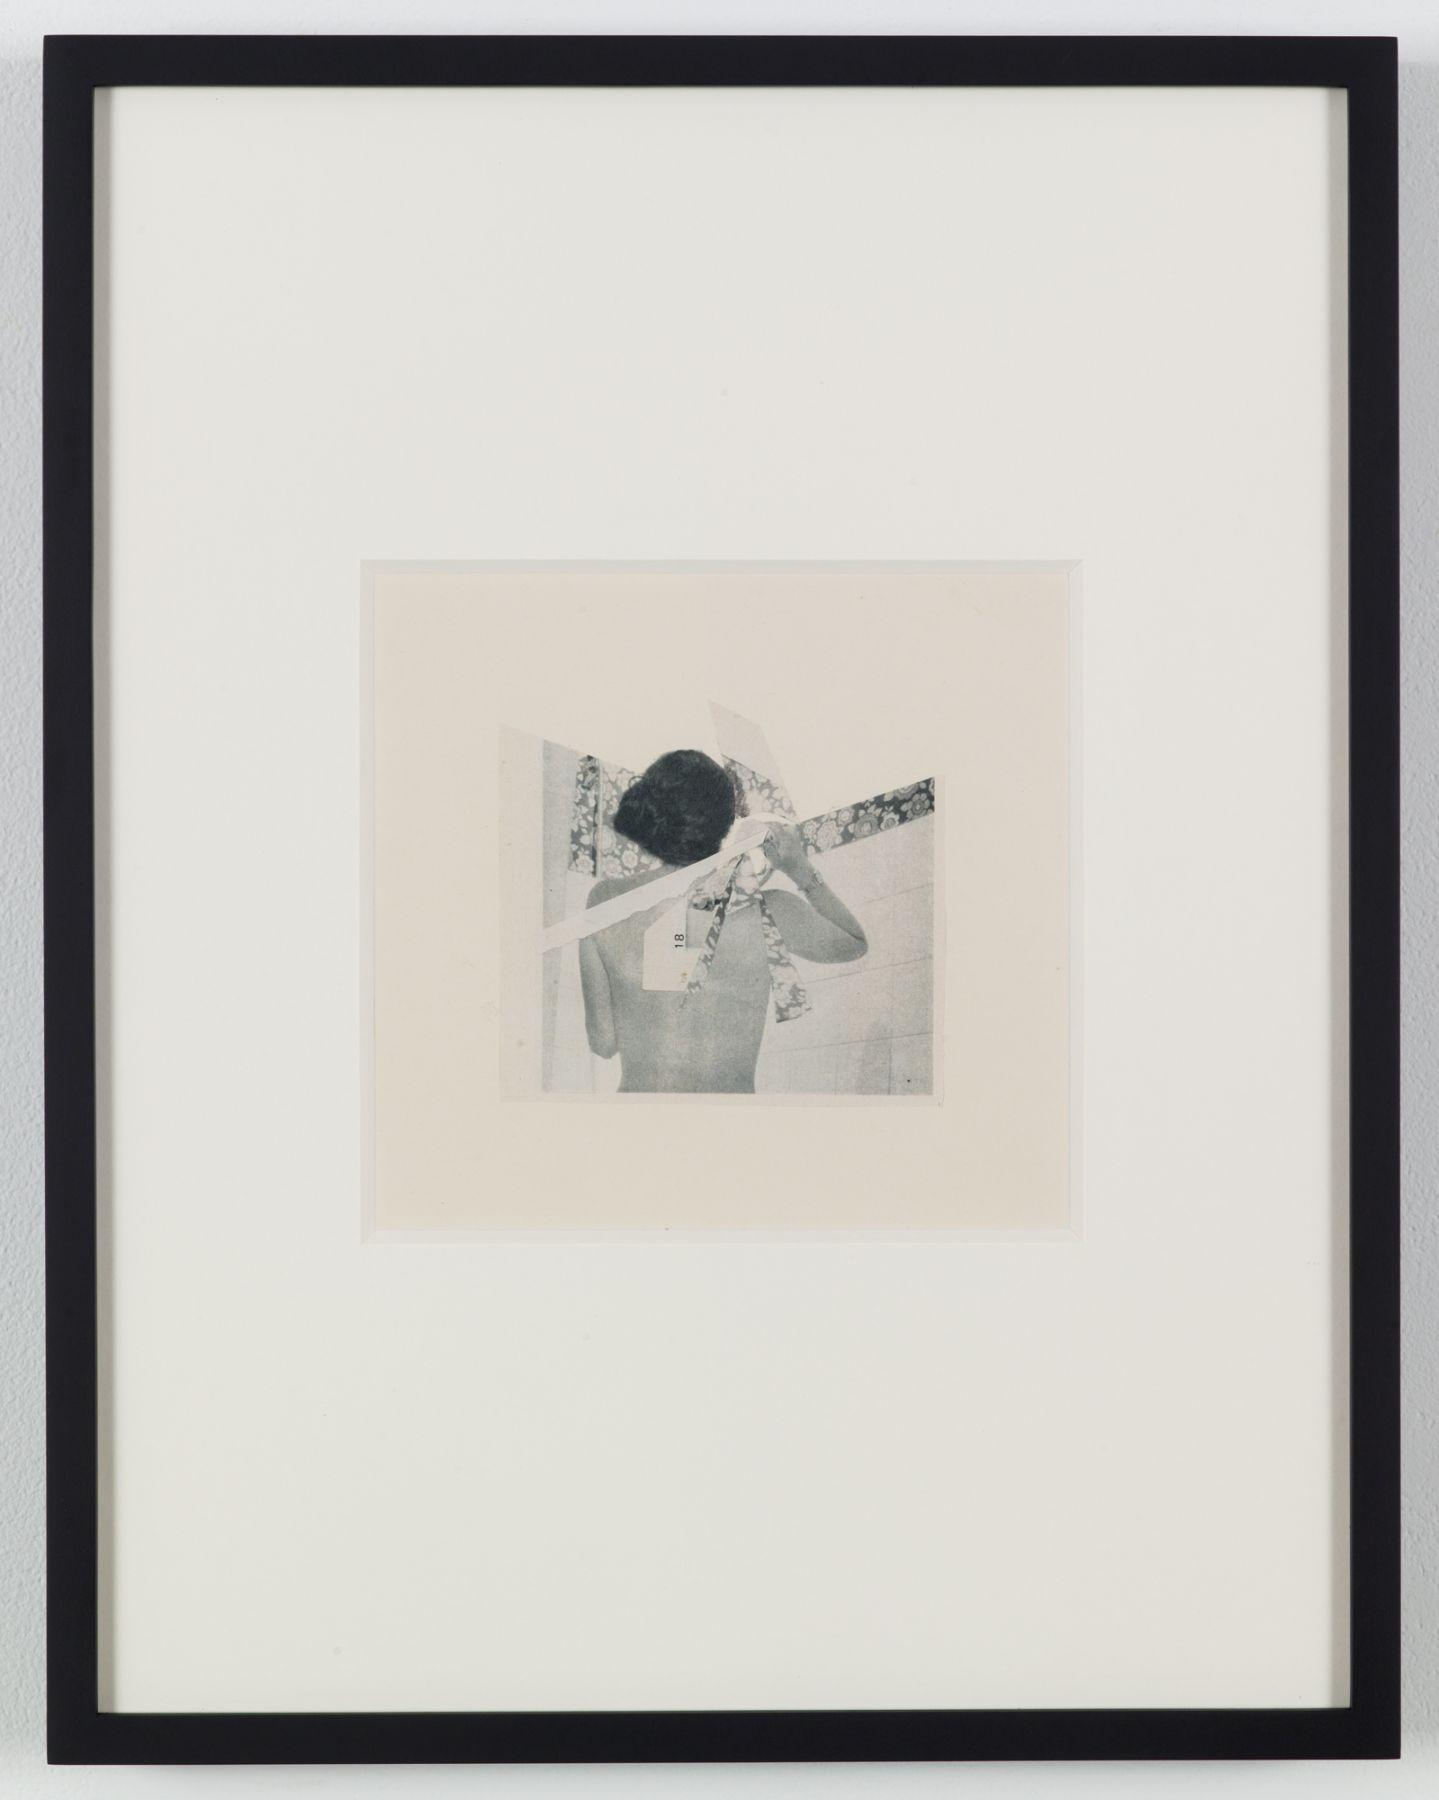 John Stezaker, Untitled (Photoroman)